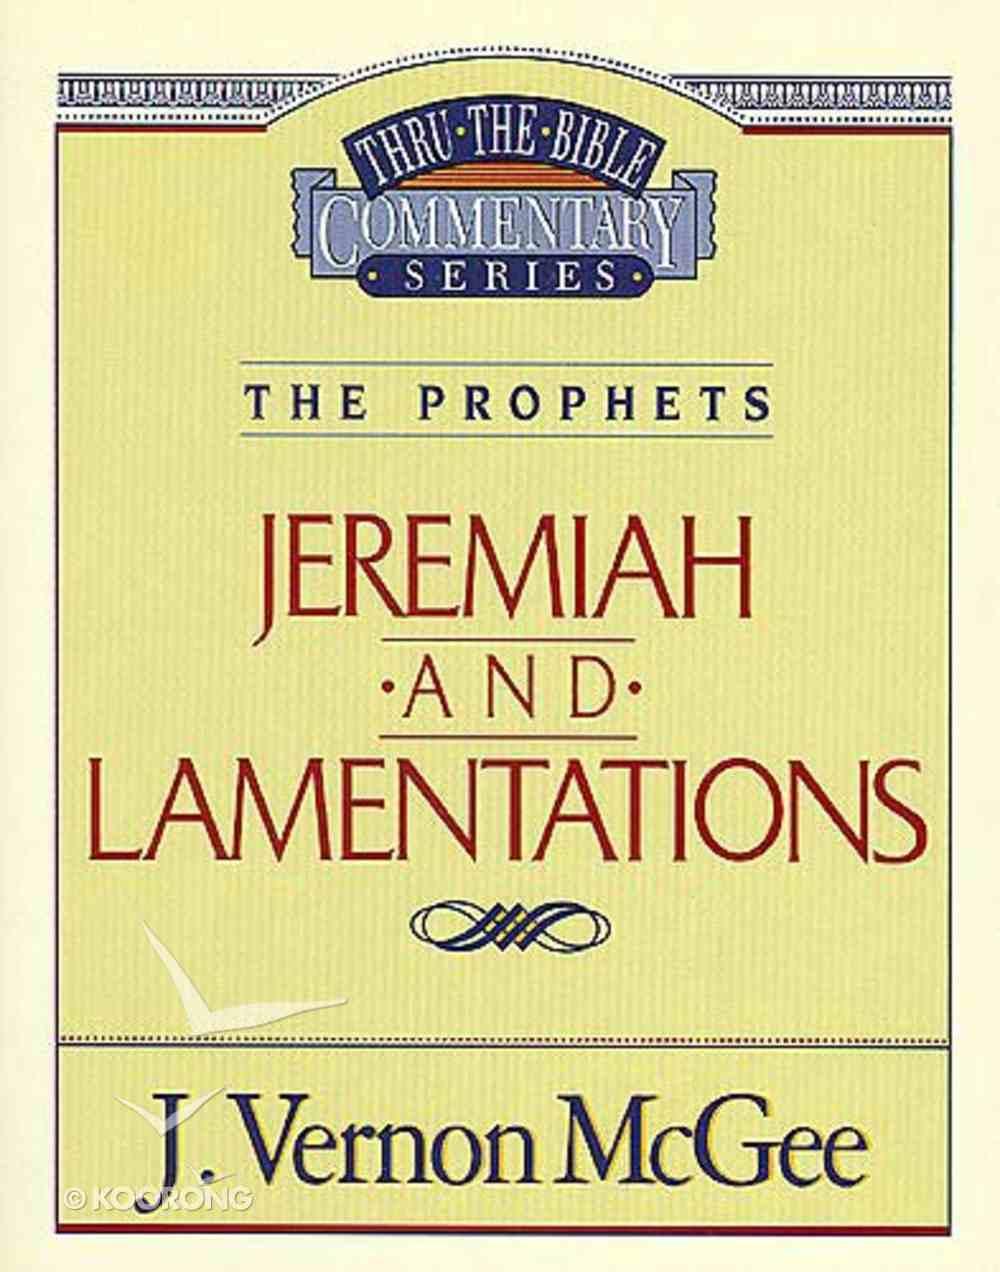 Thru the Bible OT #24: Jeremiah/Lamentations (#24 in Thru The Bible Old Testament Series) Paperback